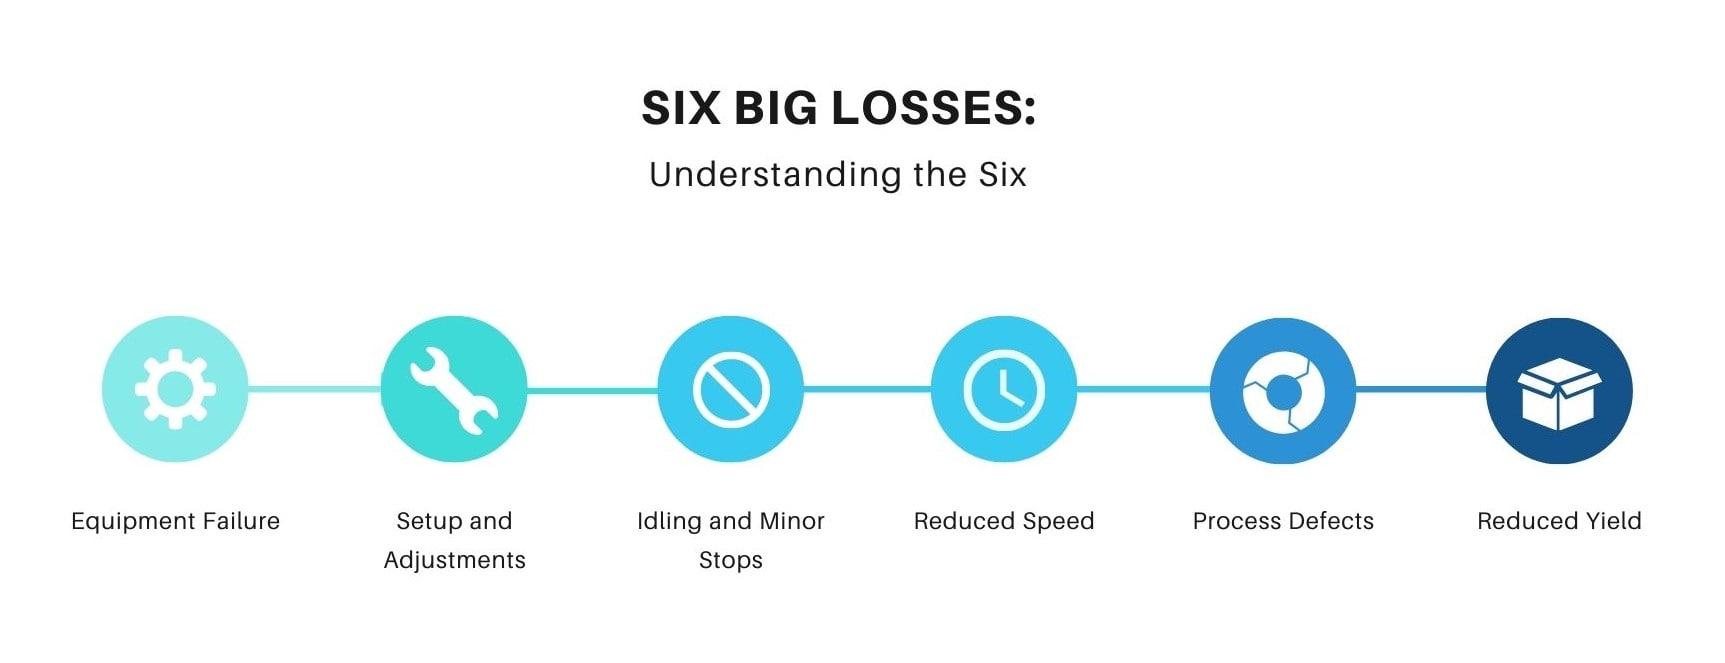 Six Big Losses: Understanding the Six